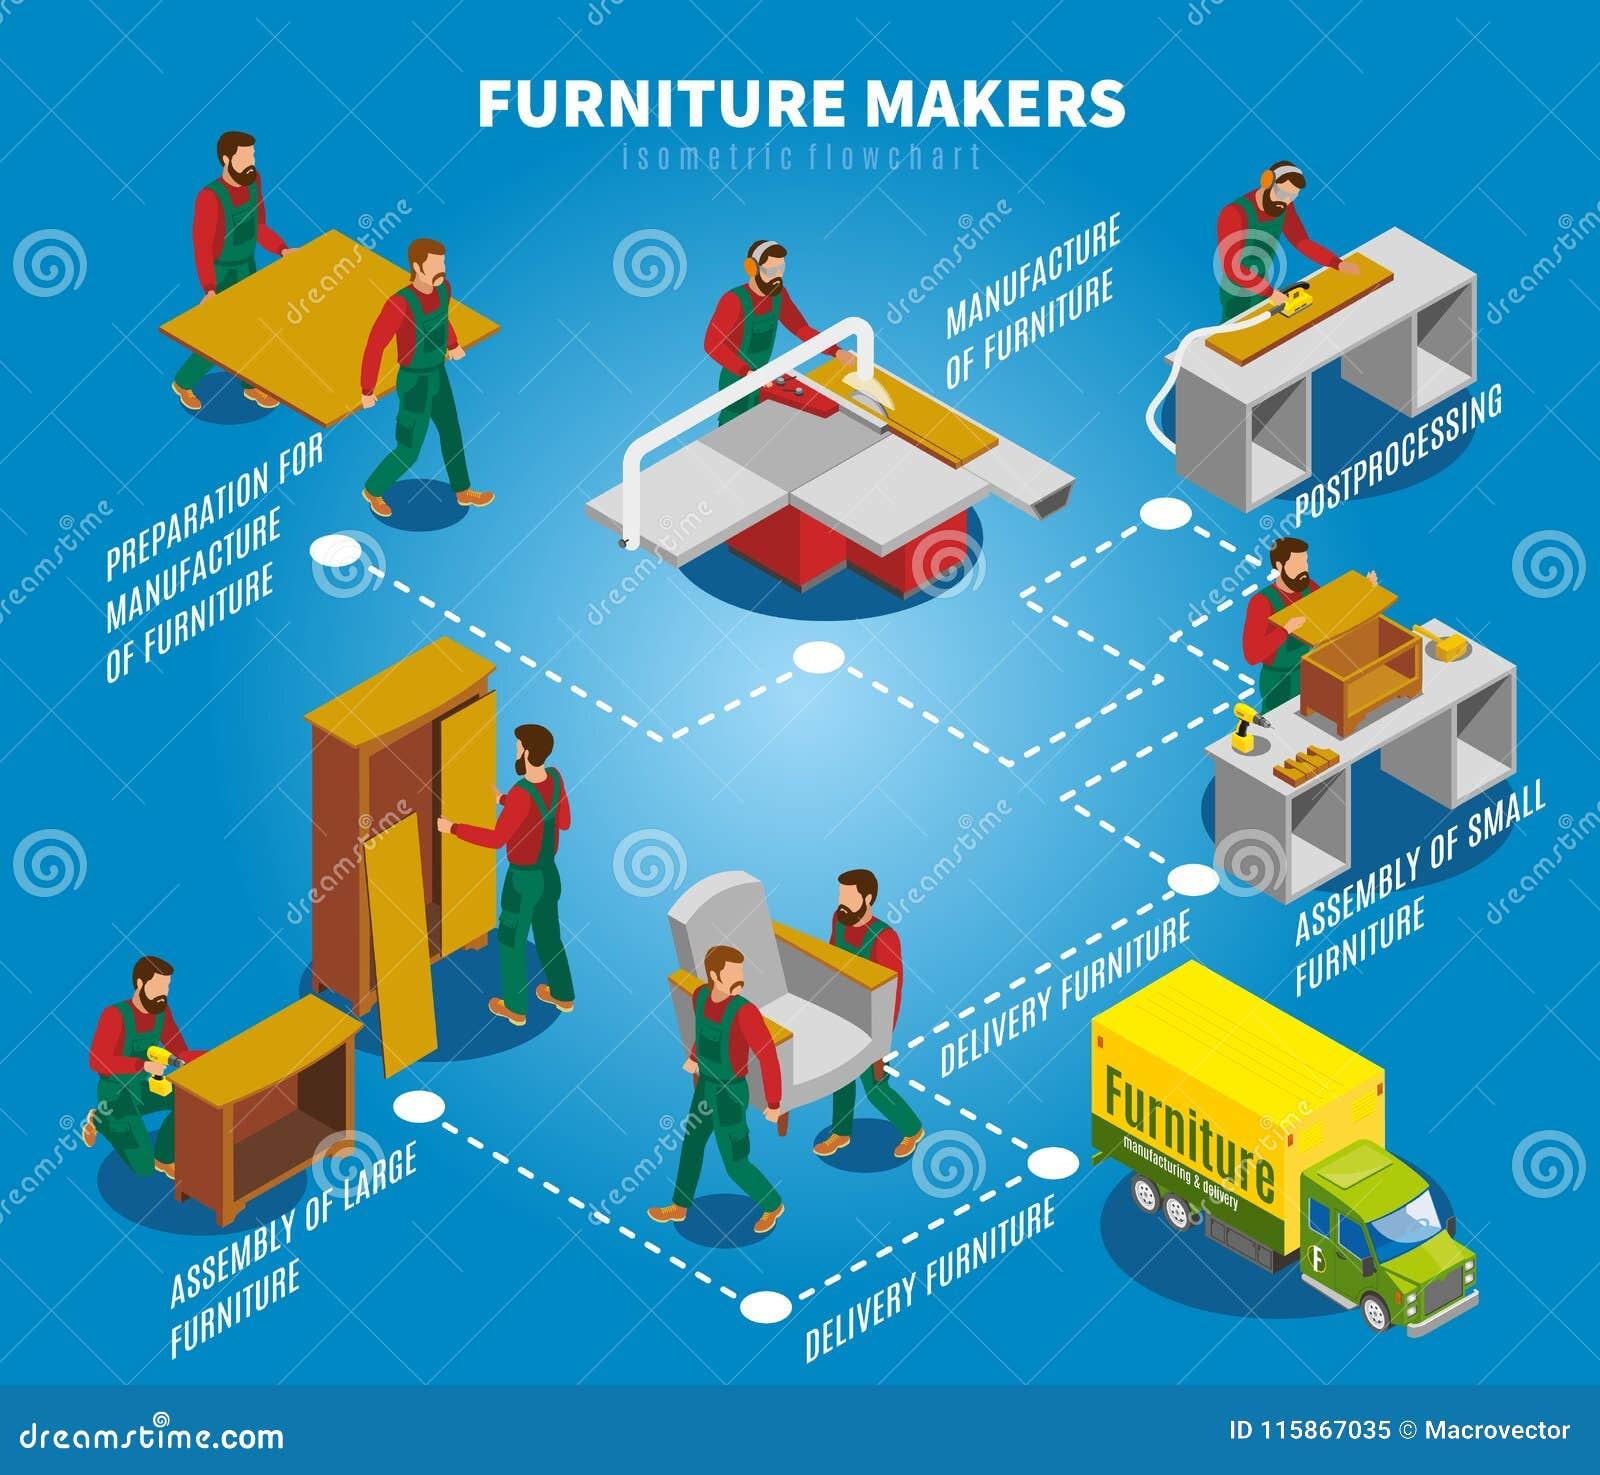 Furniture Makers Isometric Flowchart Stock Vector Illustration Of